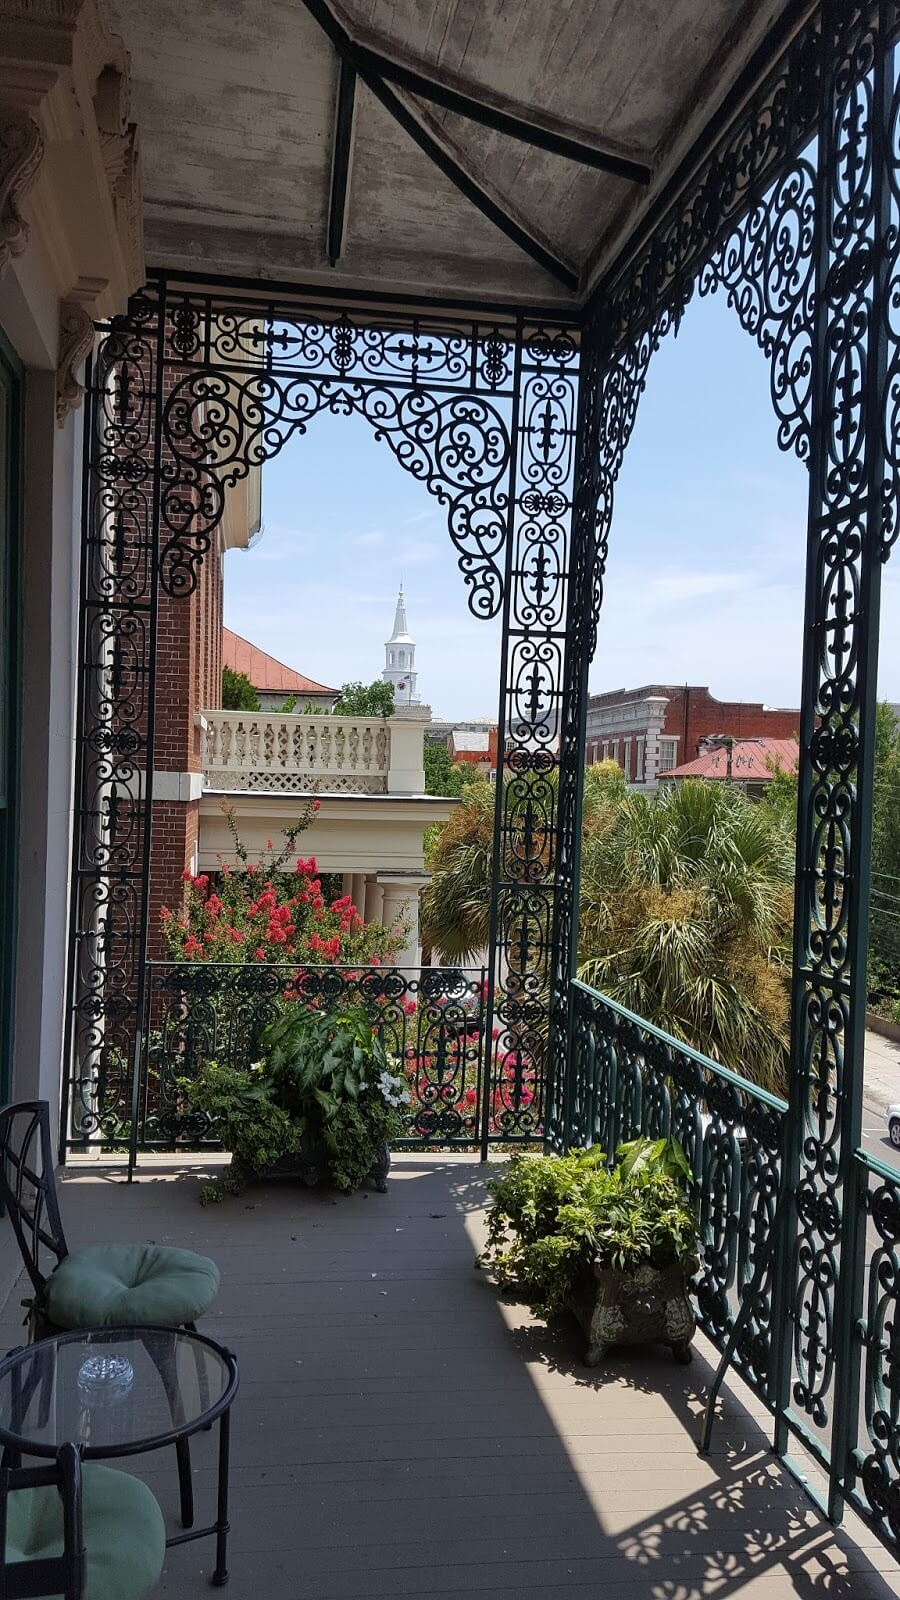 View of Charleston from the veranda of John Rutledge House